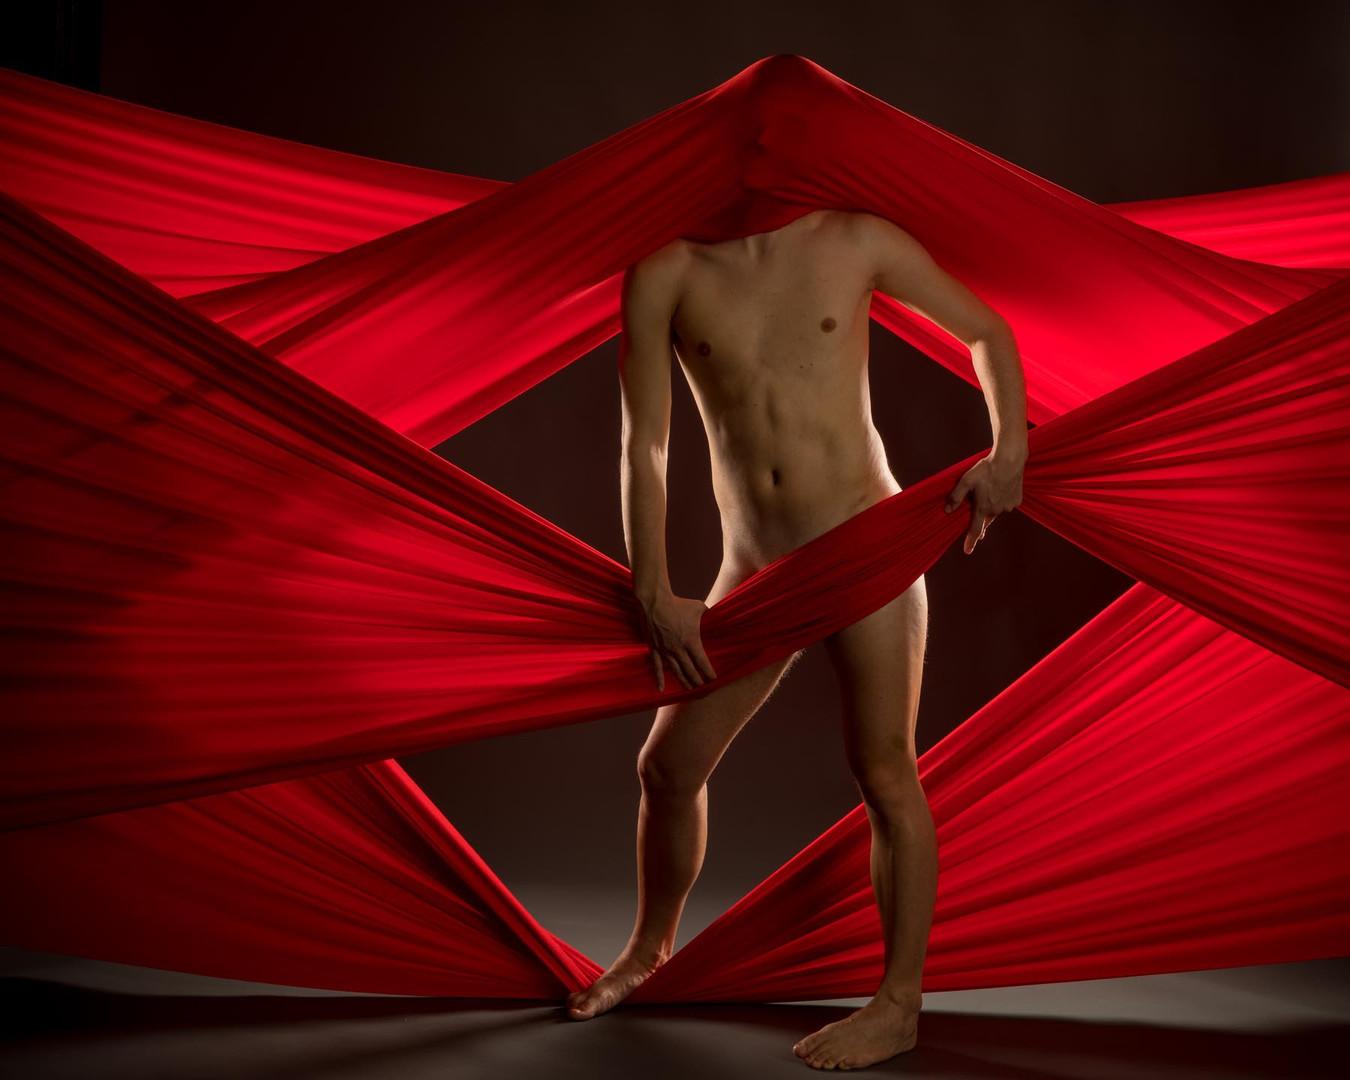 Model Bryan Falcone